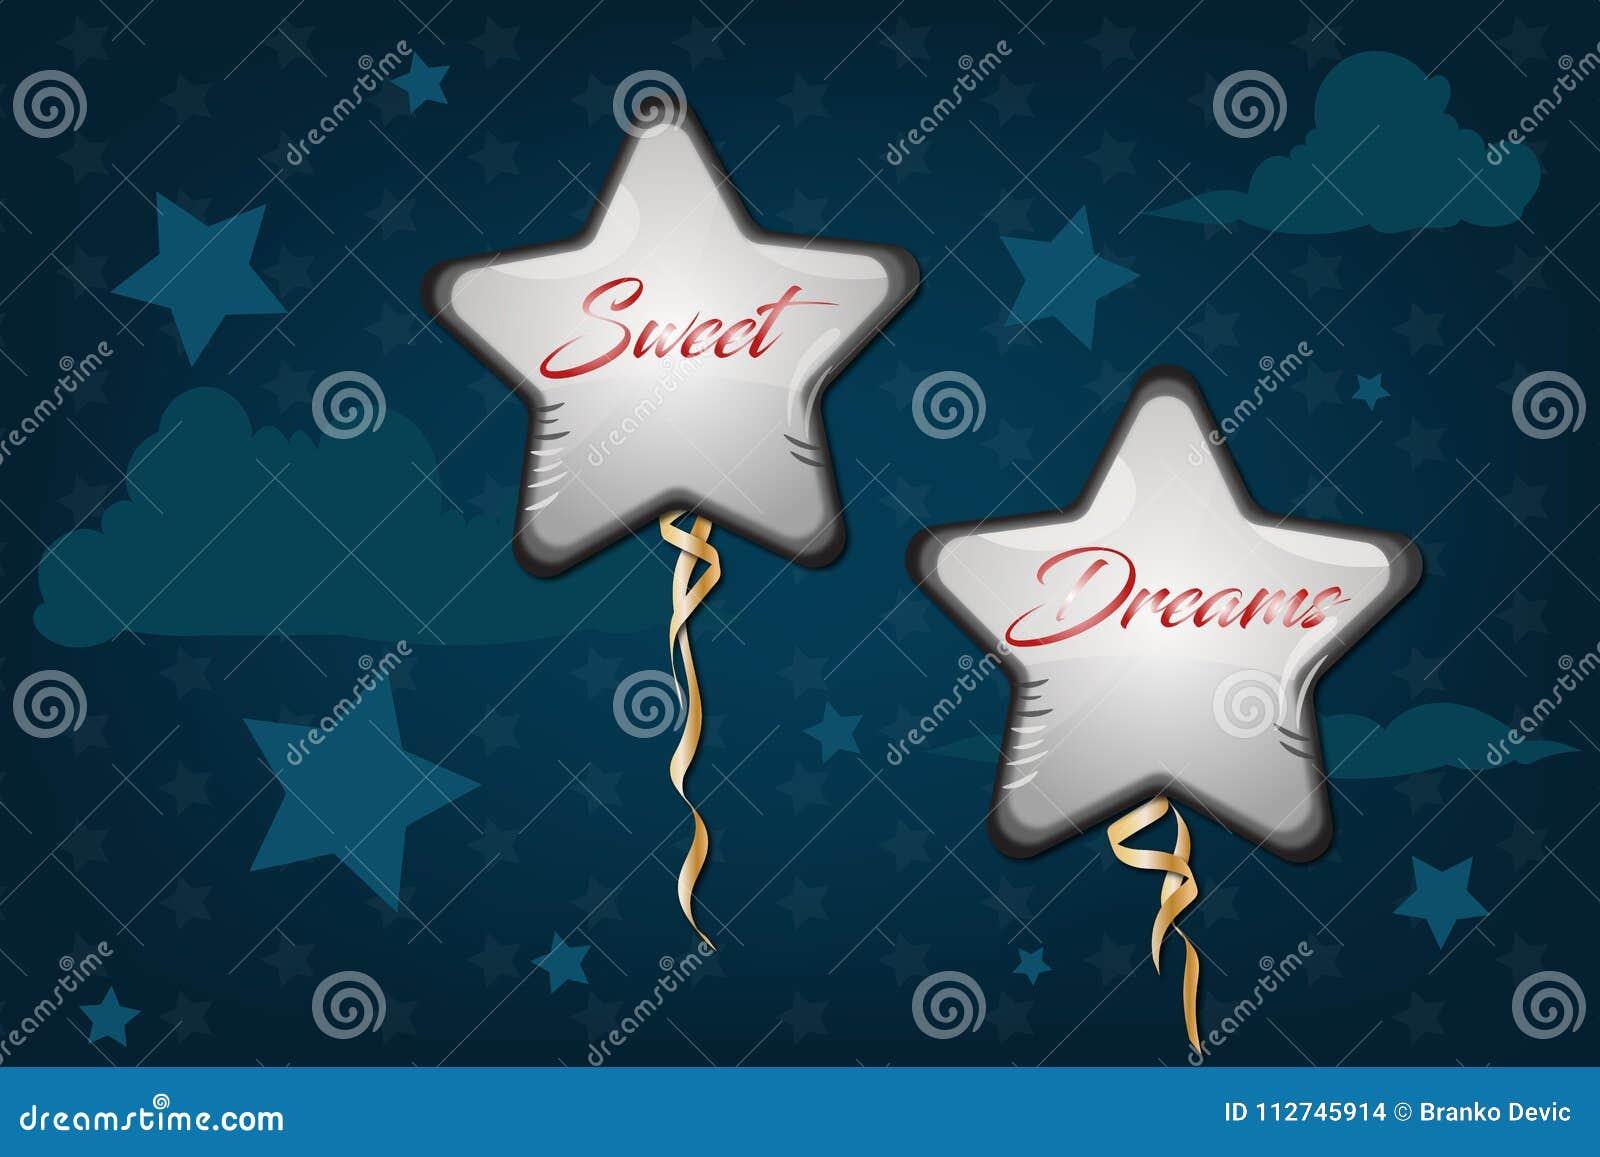 Good Night And Sweet Dreams Illustration Design Stock Illustration